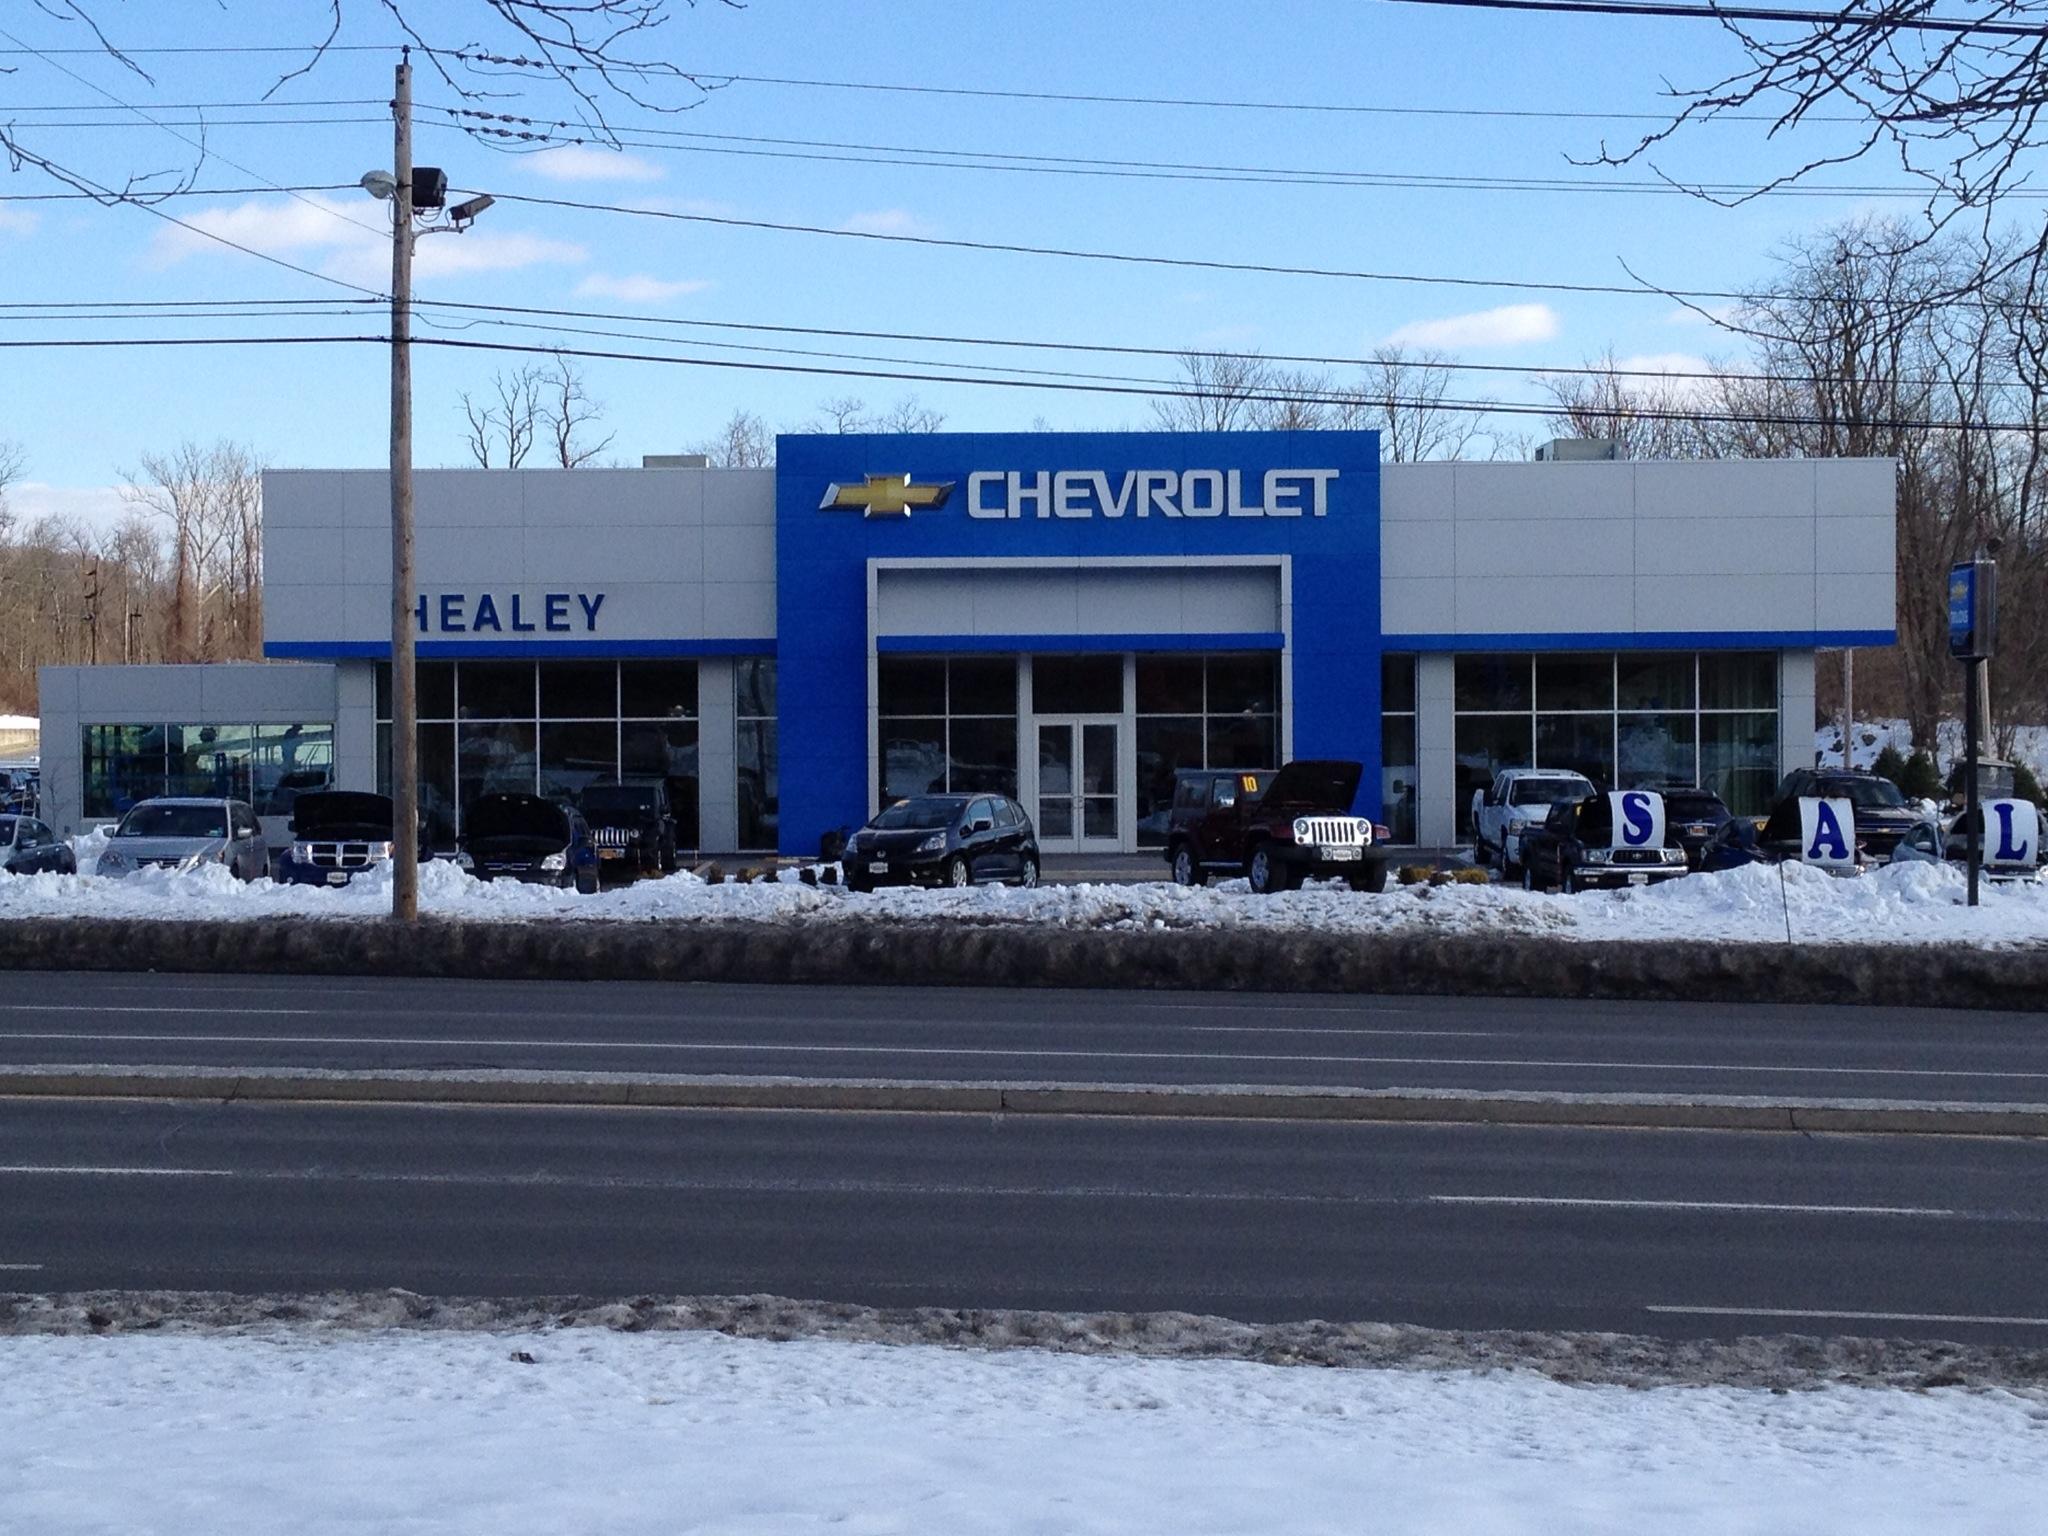 Healey Chevrolet